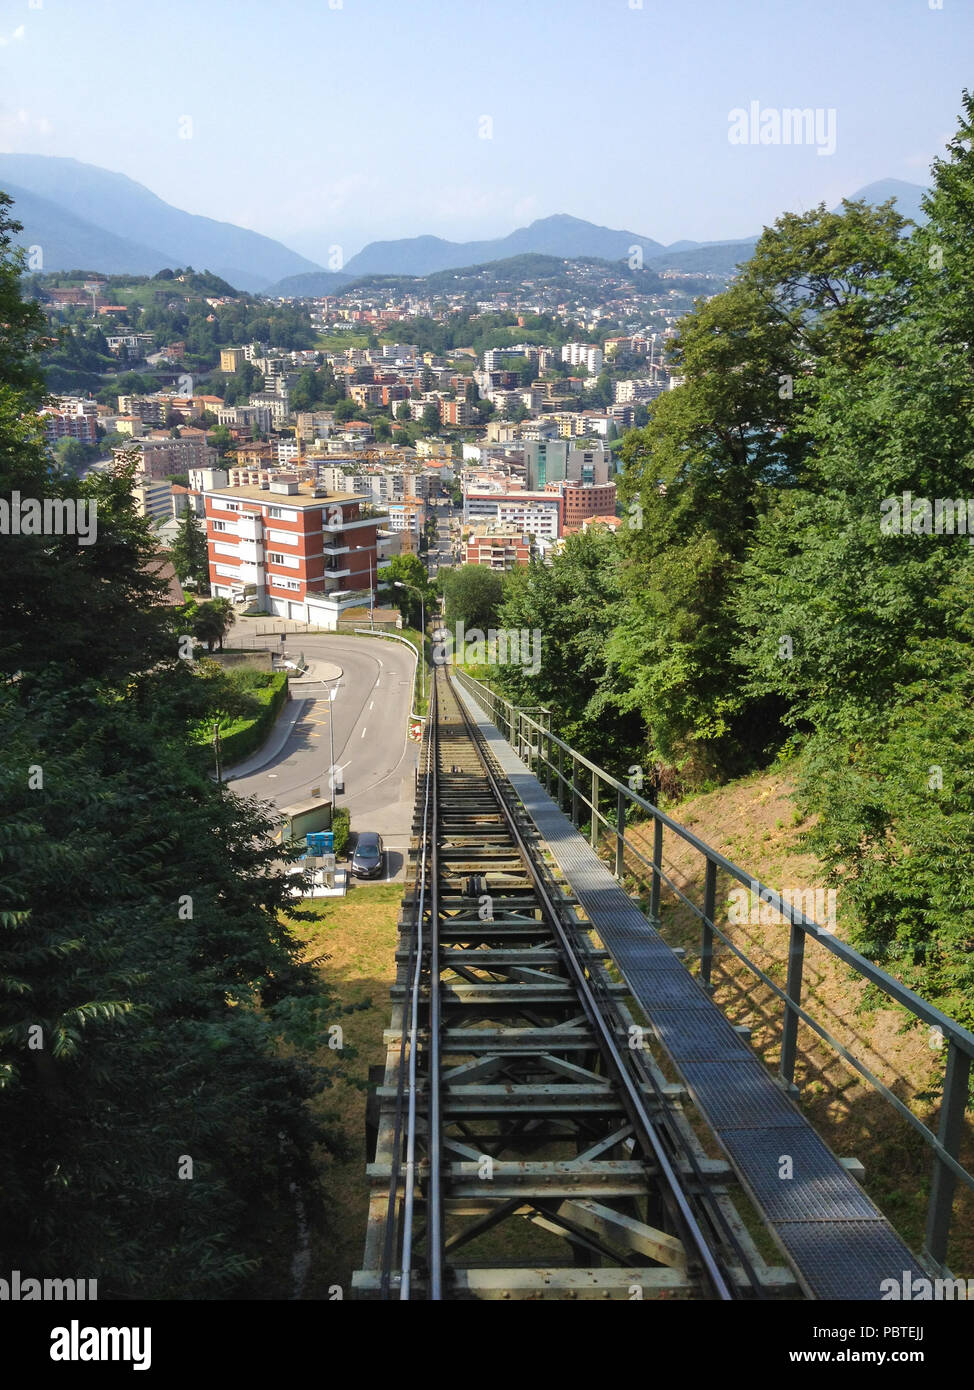 Funicular Transportation from Paradiso to top of Monte San Salvatore, Lugano, Switzerland Stock Photo